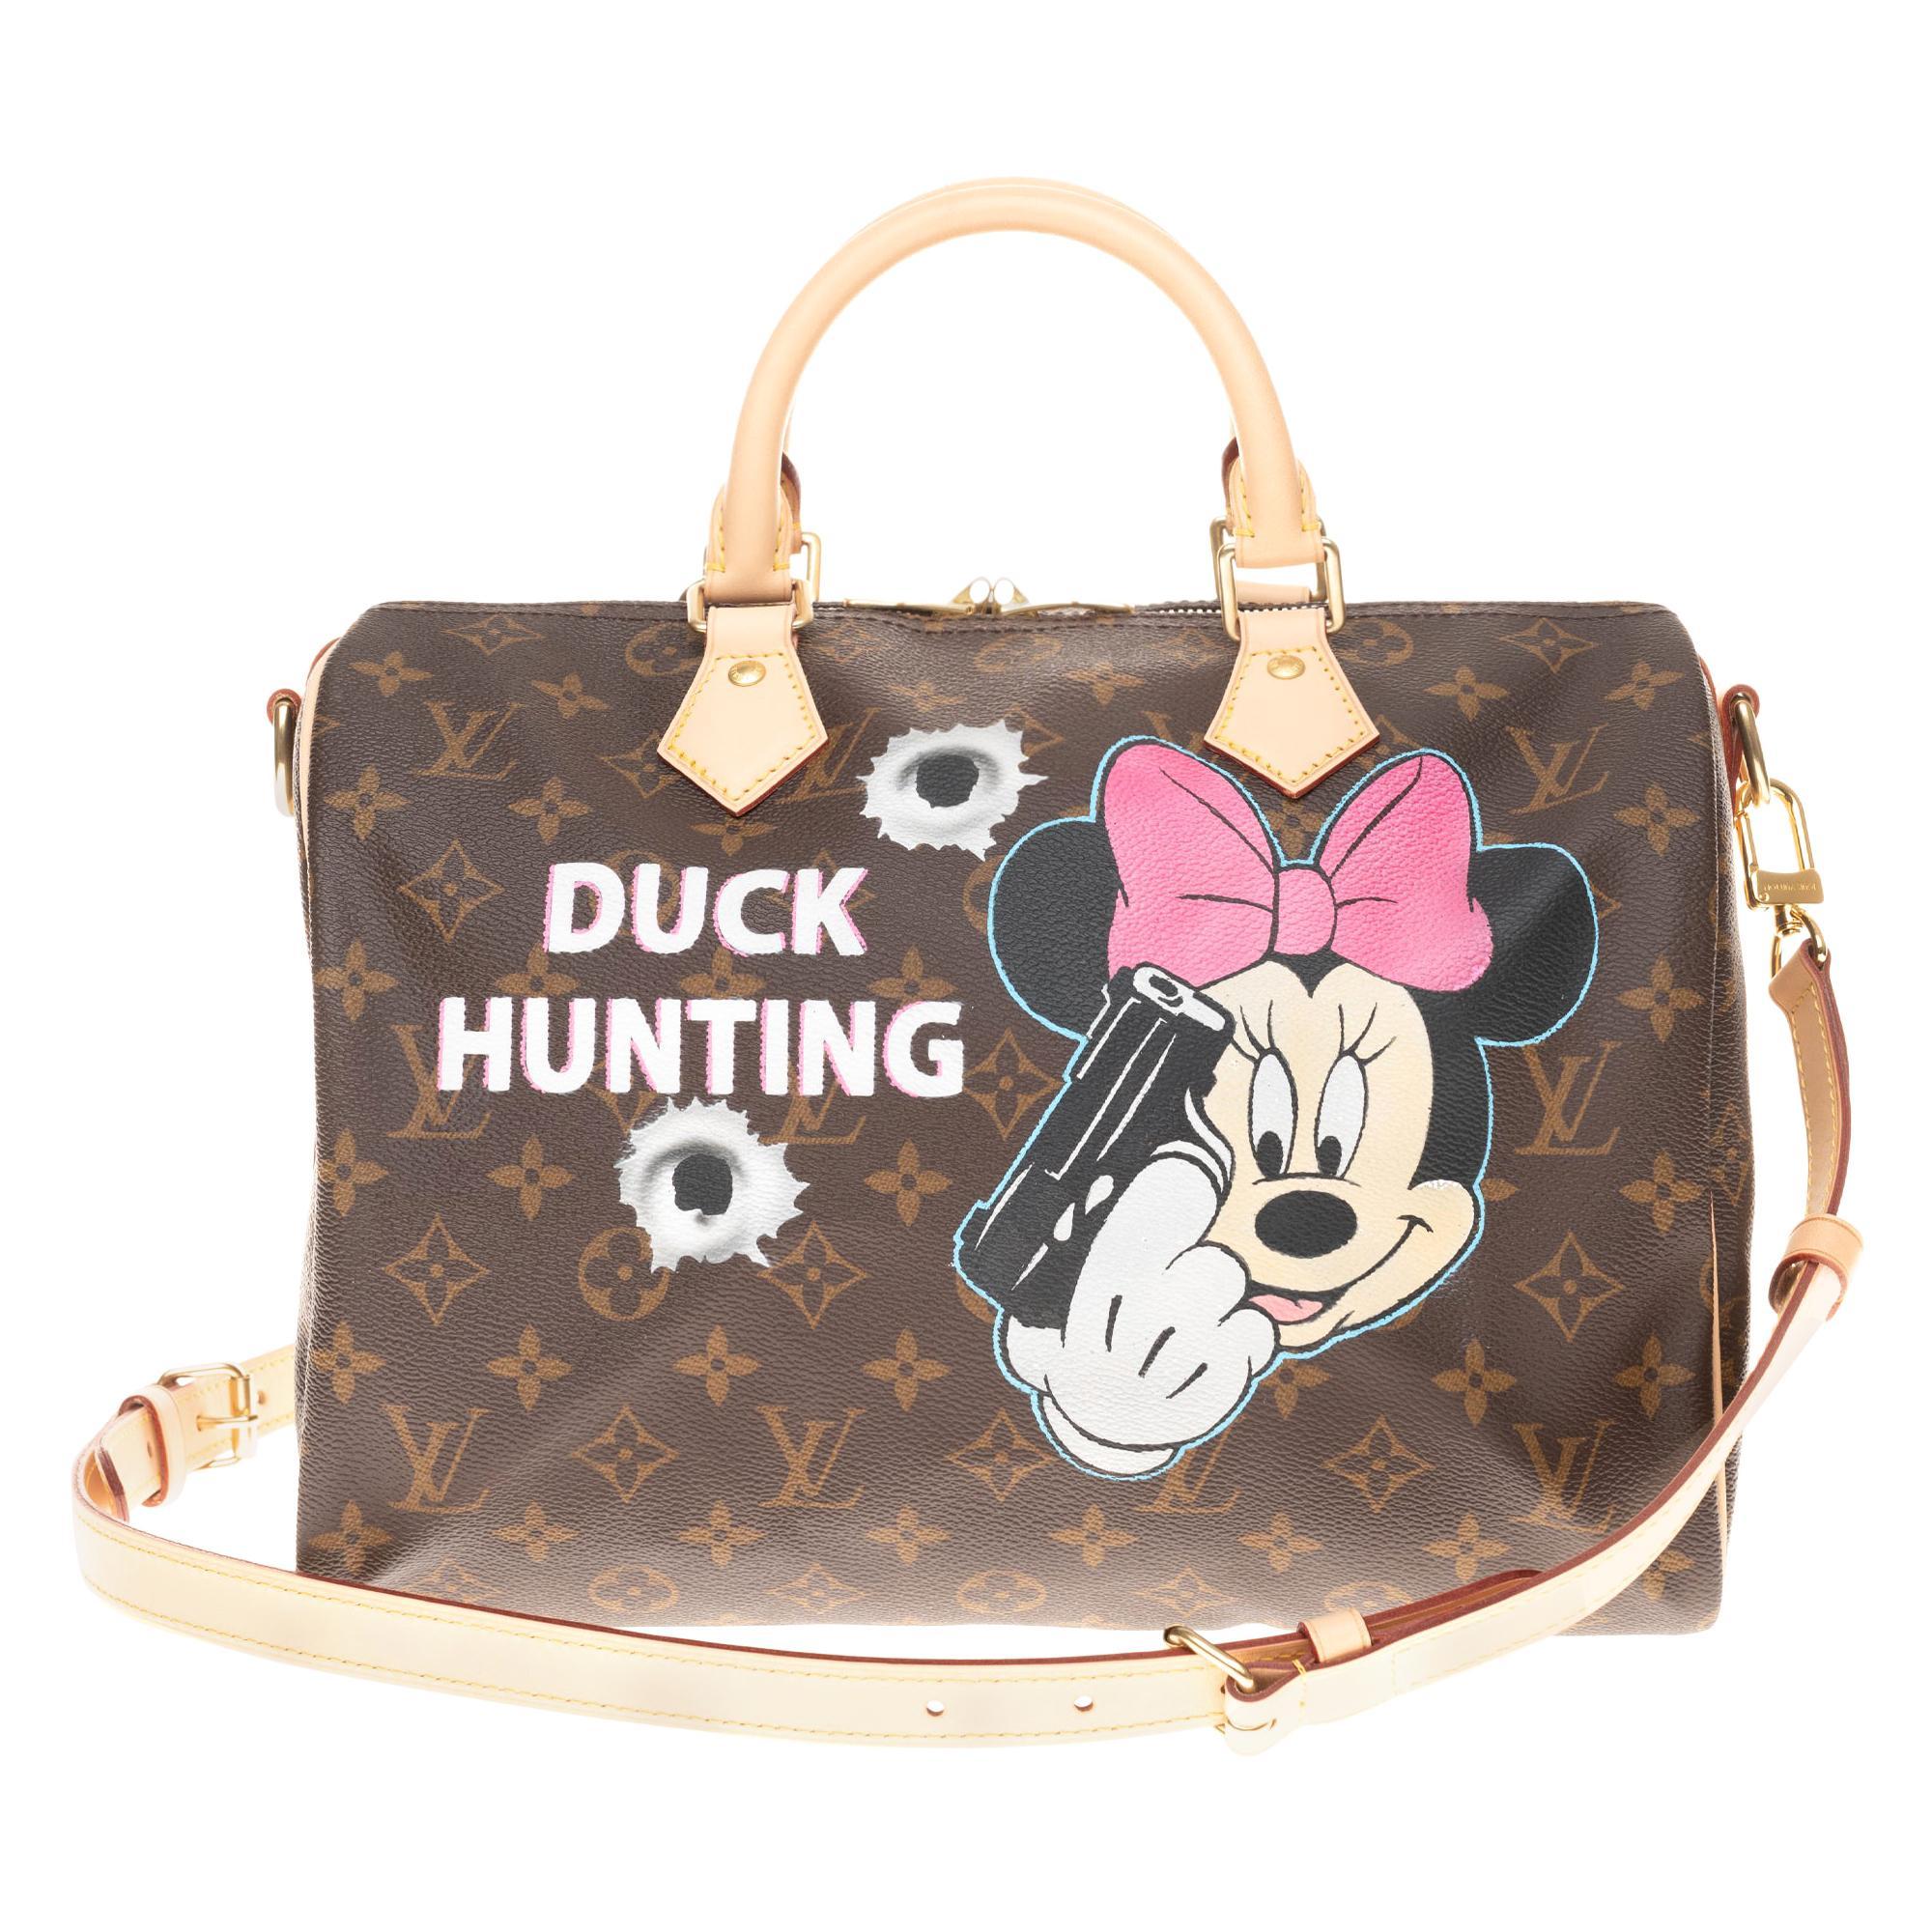 "Brand New Louis Vuitton Speedy 30 in Monogram canvas customized ""Duck Hunting""!"